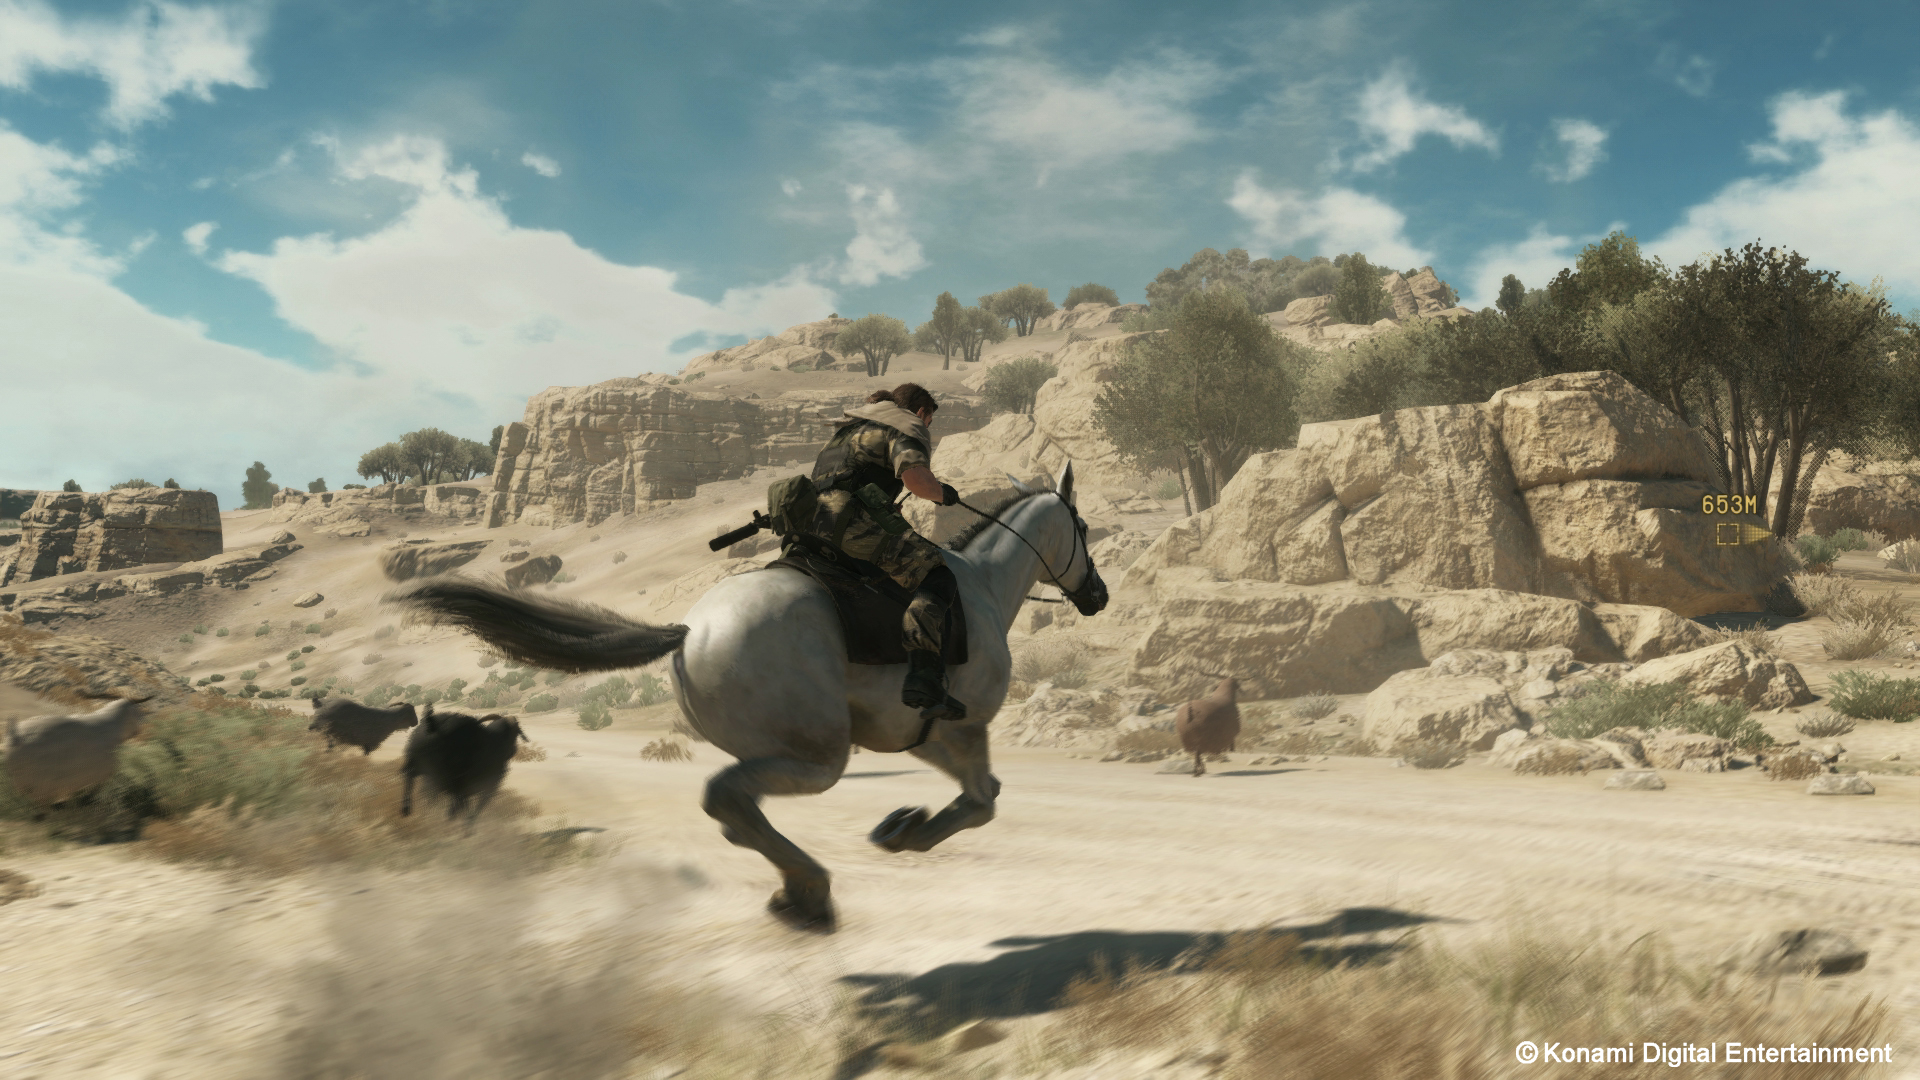 Metal-Gear-Solid-V-The-Phantom-Pain_2014_06-09-14_011